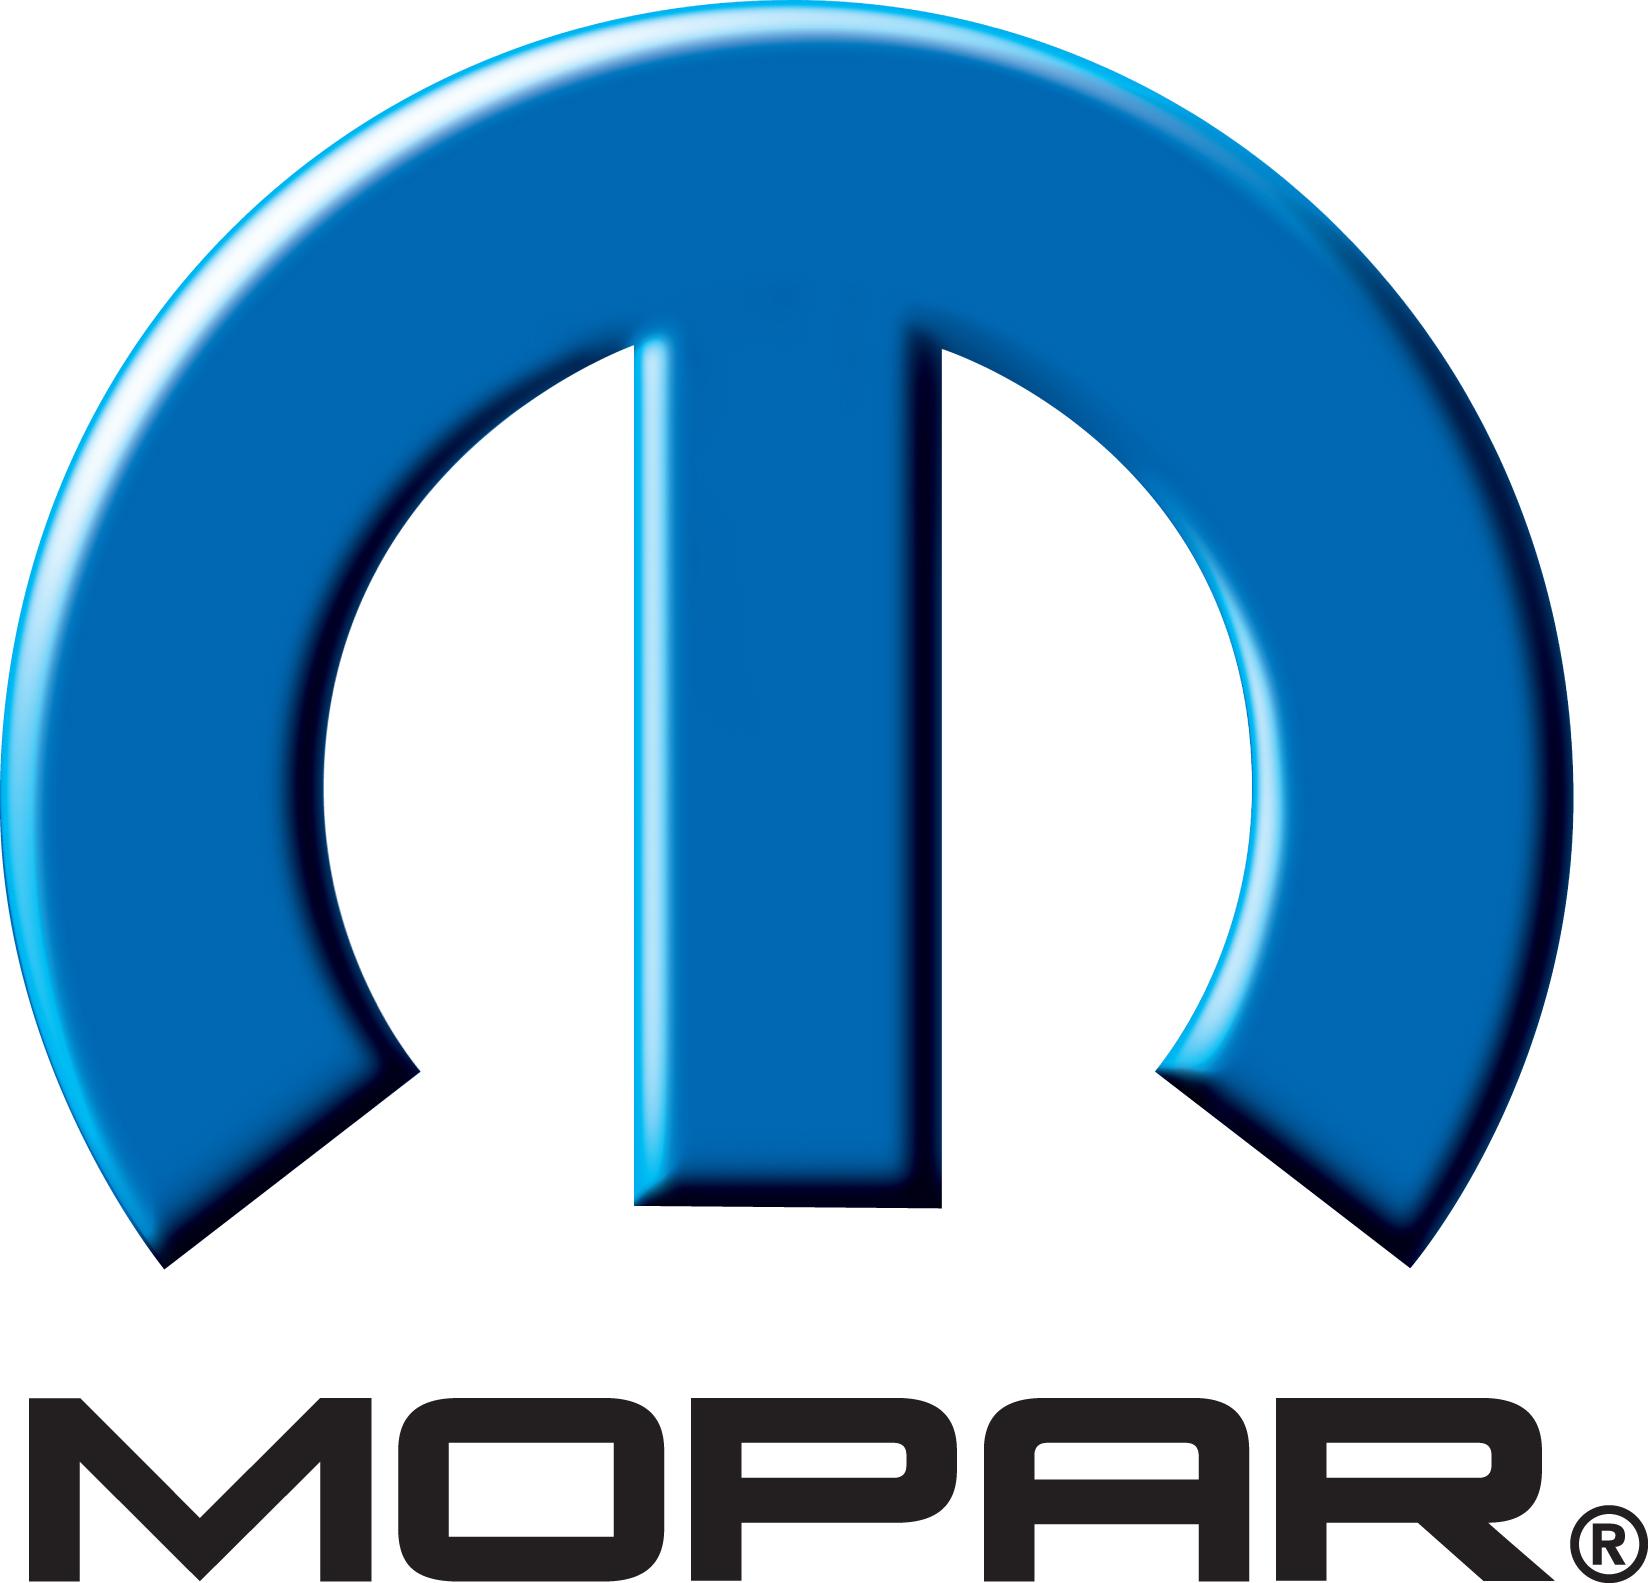 Chryslers Mopar to Expand Dealer Ops to 7 Days Mopar logo 1648x1583